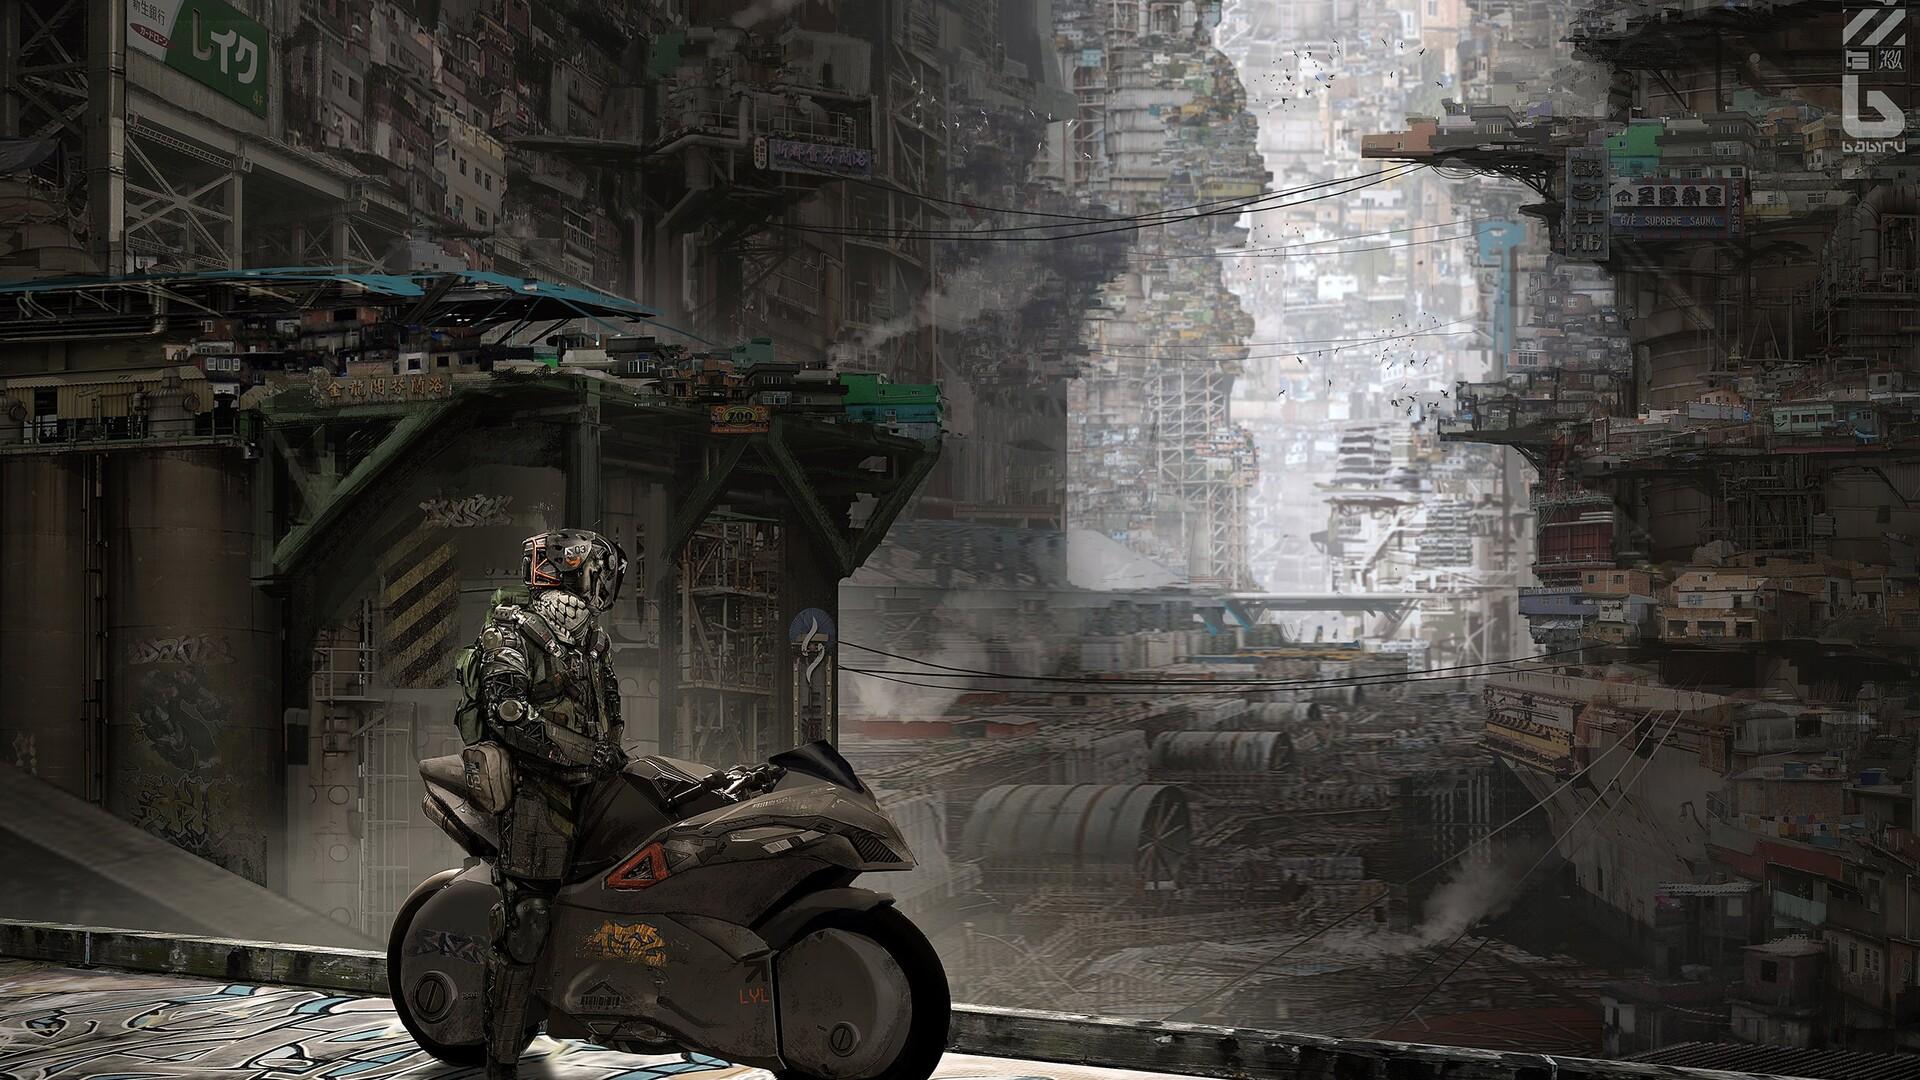 motorcycle-science-fiction-wide.jpg